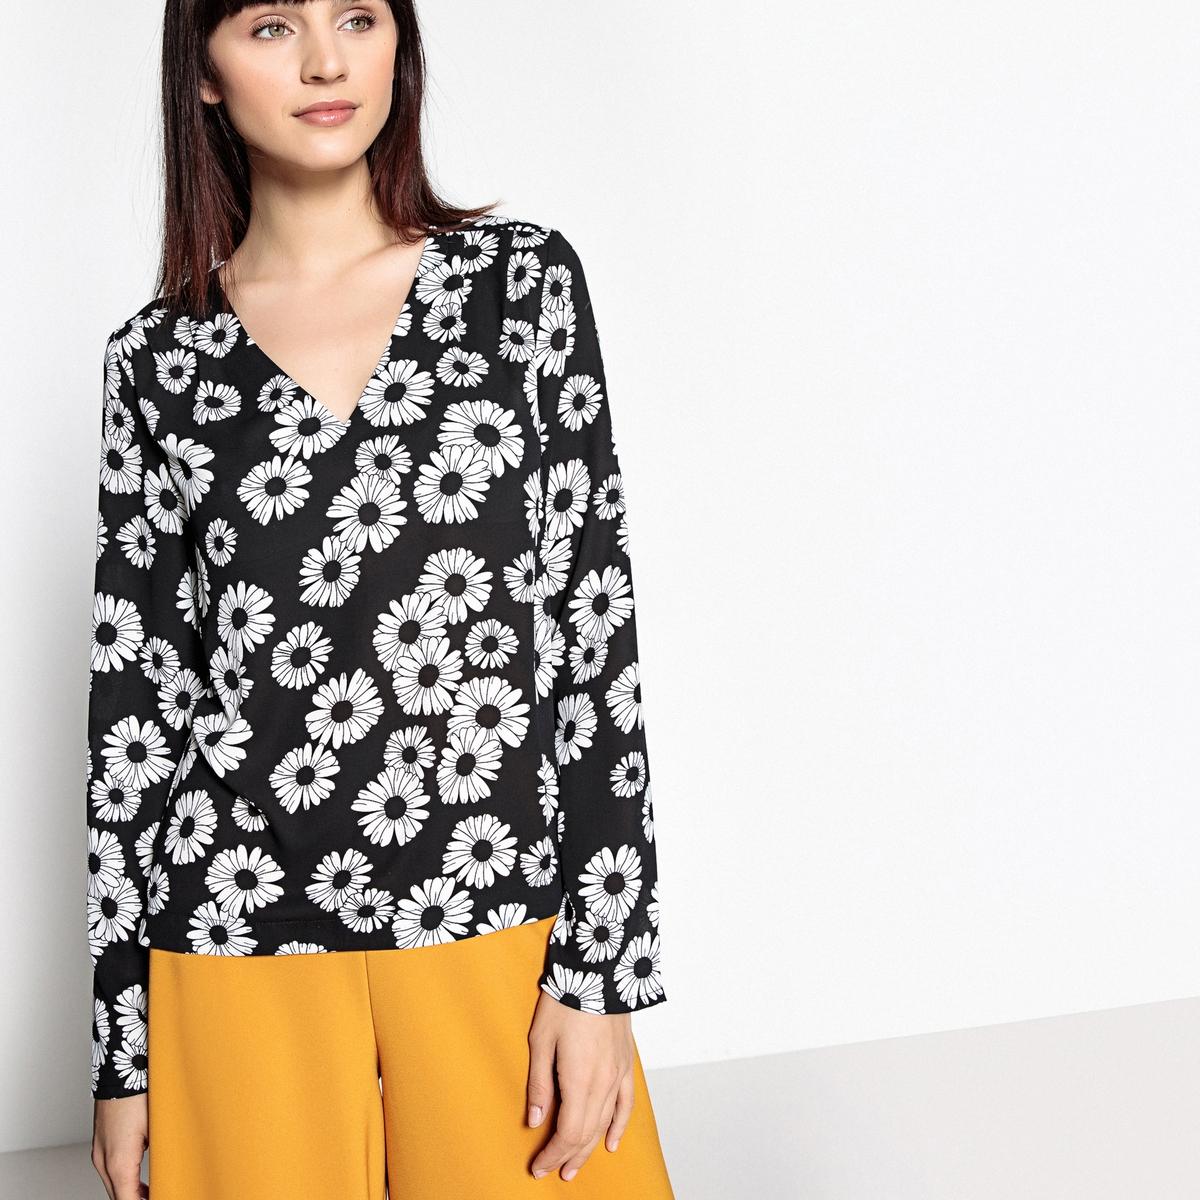 Блузка с рисунком маргаритки